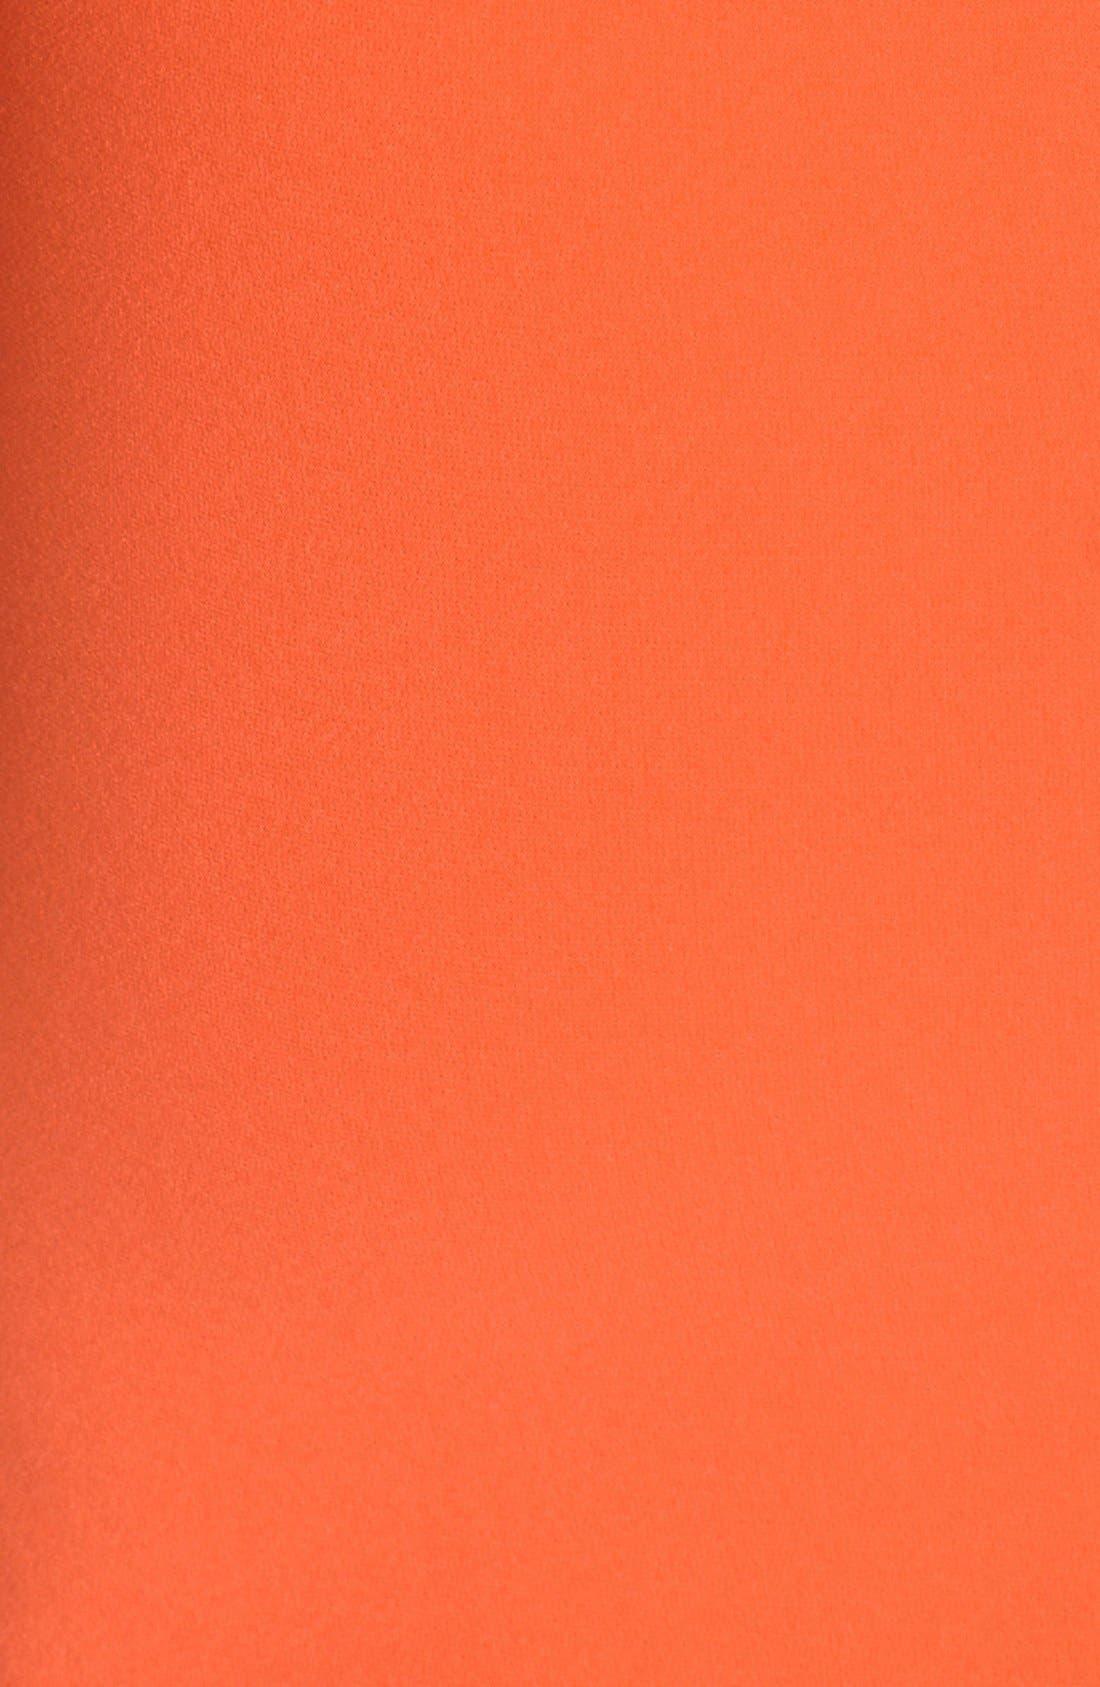 ALICE + OLIVIA,                             'Aleah' Off the Shoulder Sheath Dress,                             Alternate thumbnail 4, color,                             810